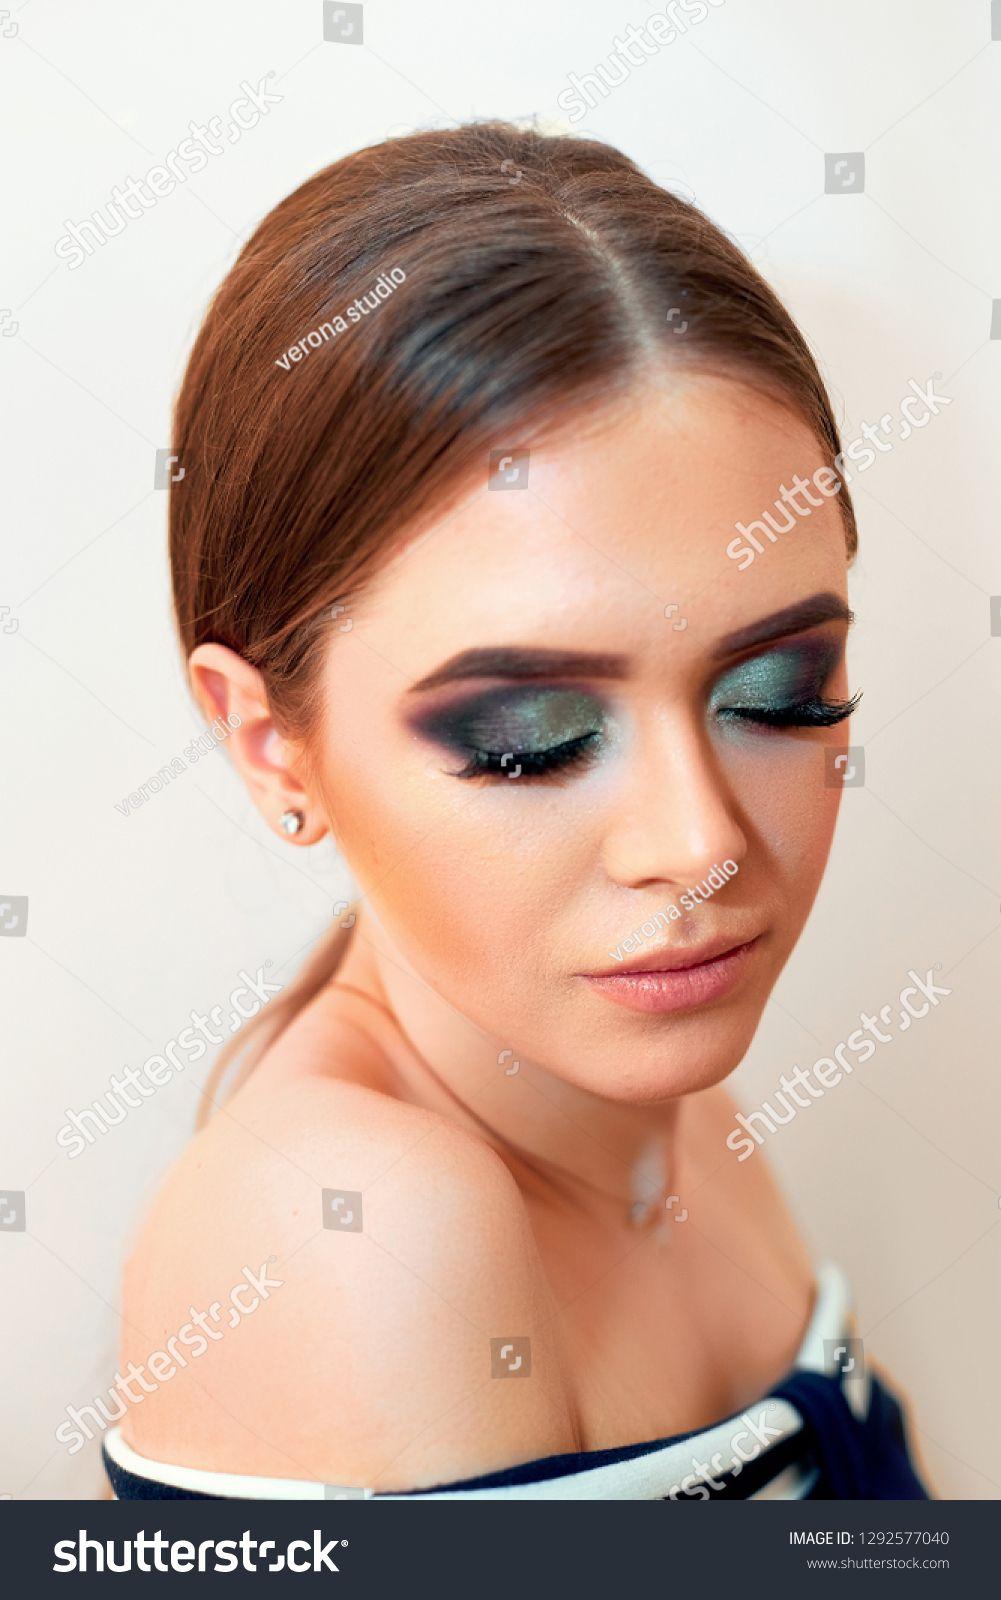 Beautiful model girl with Fashion Luxury Makeup, long eyelashes, perfect skin facial make-up. Beauty Brunette model woman holiday make up close up. Eyelash extensions, false eyelashes. Beauty Woman #Sponsored , #Affiliate, #long#Makeup#eyelashes#skin